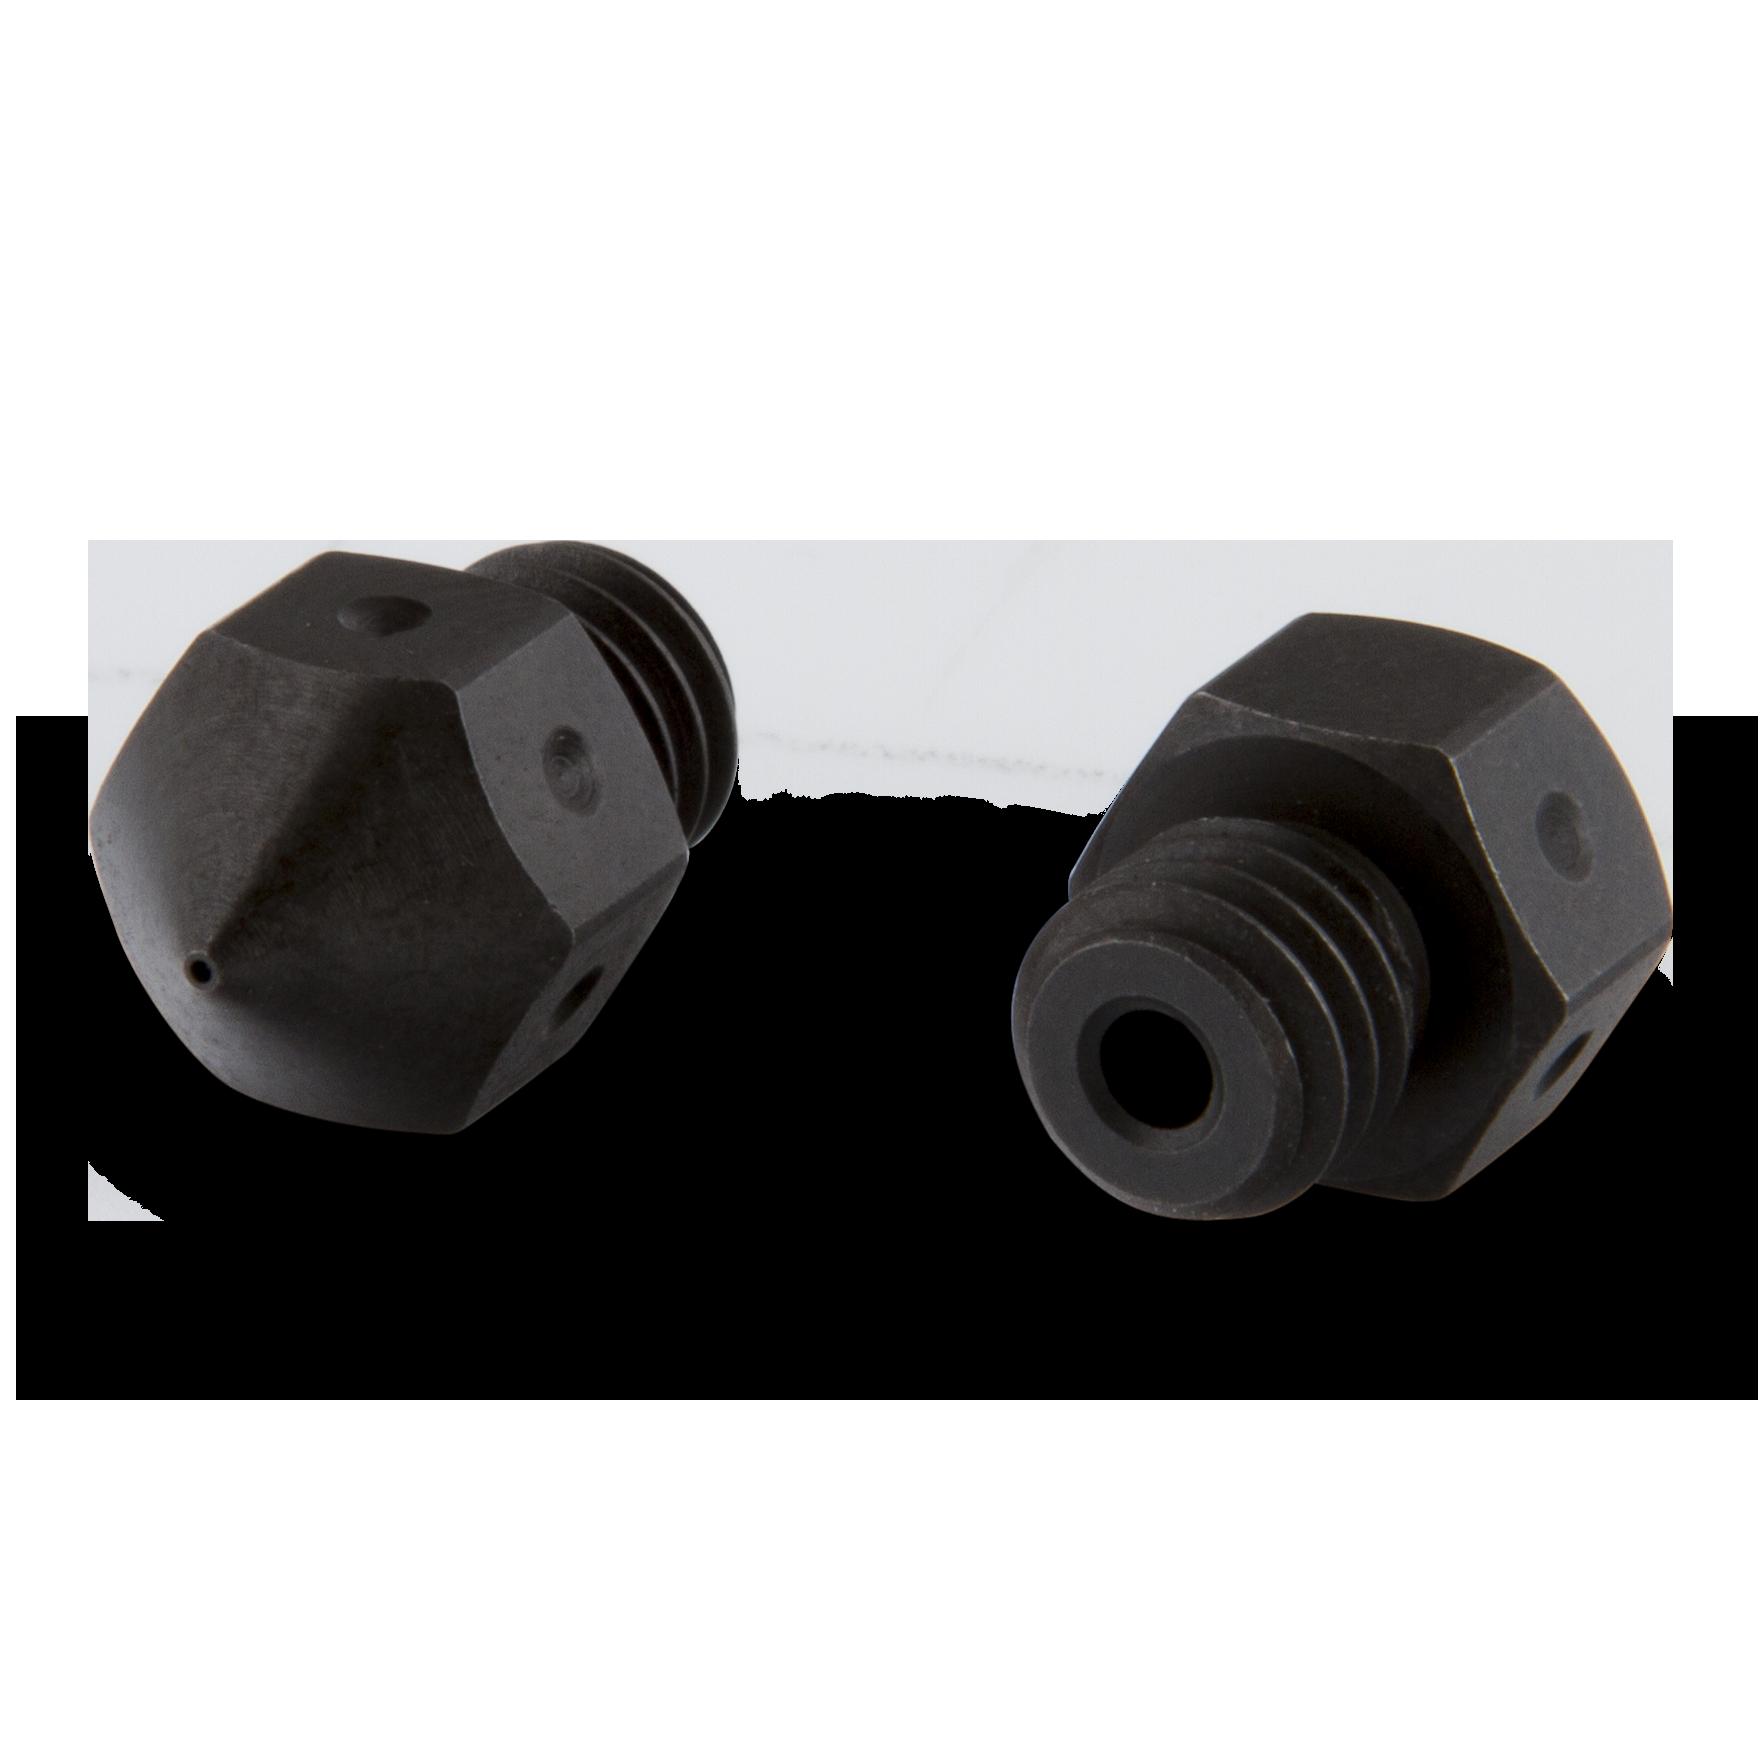 MK8 Hardened Steel Nozzle 0,4 mm - 1 pc